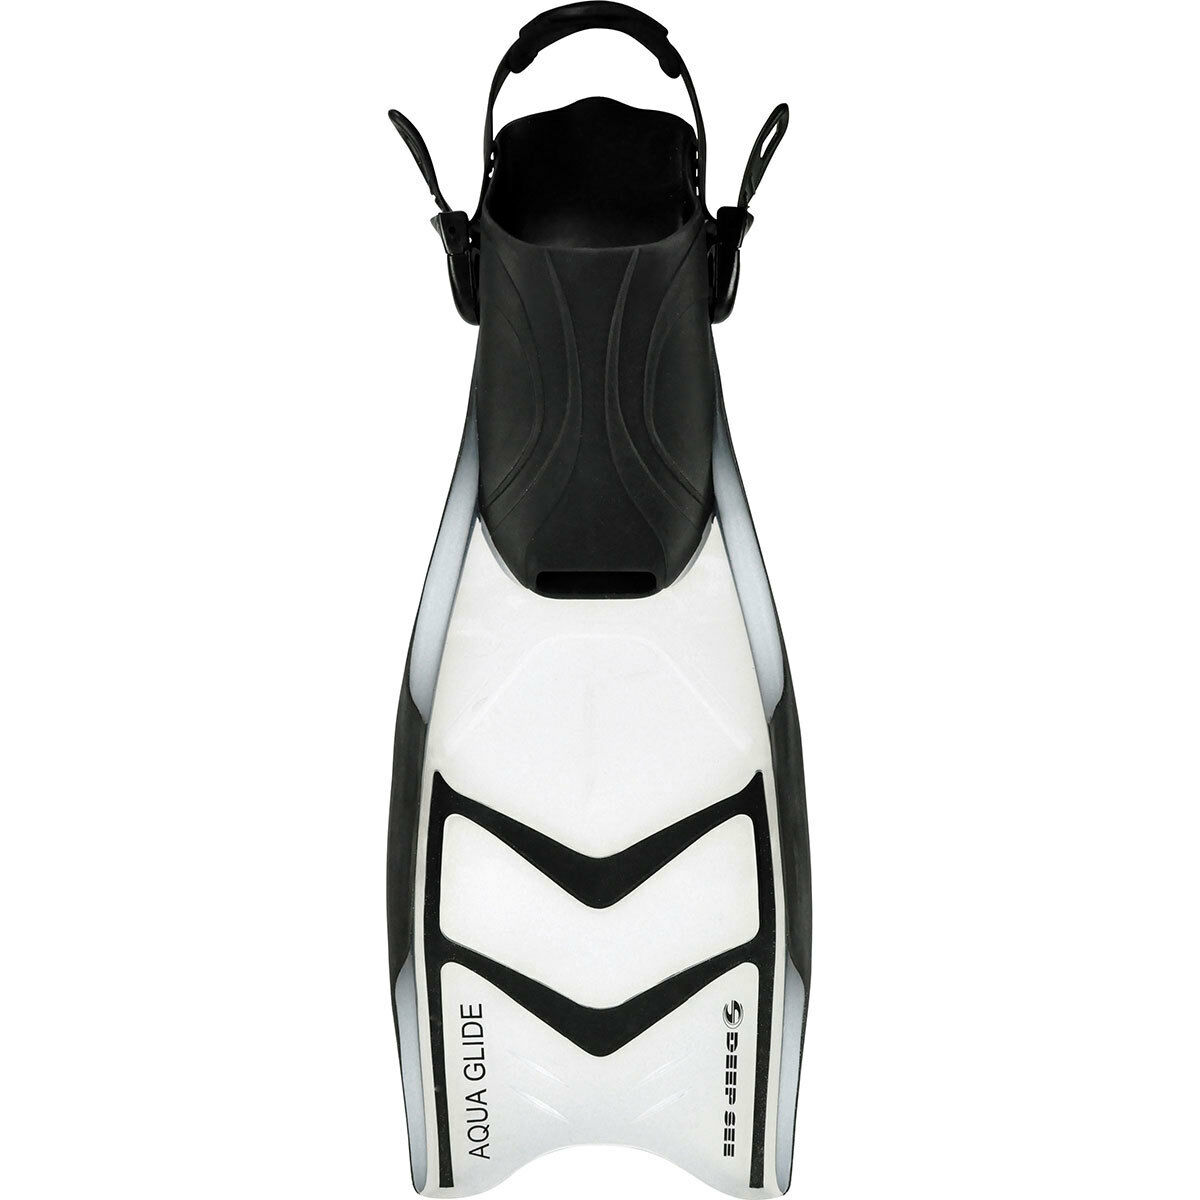 Deep See Aqua Glide Snorkeling Fins